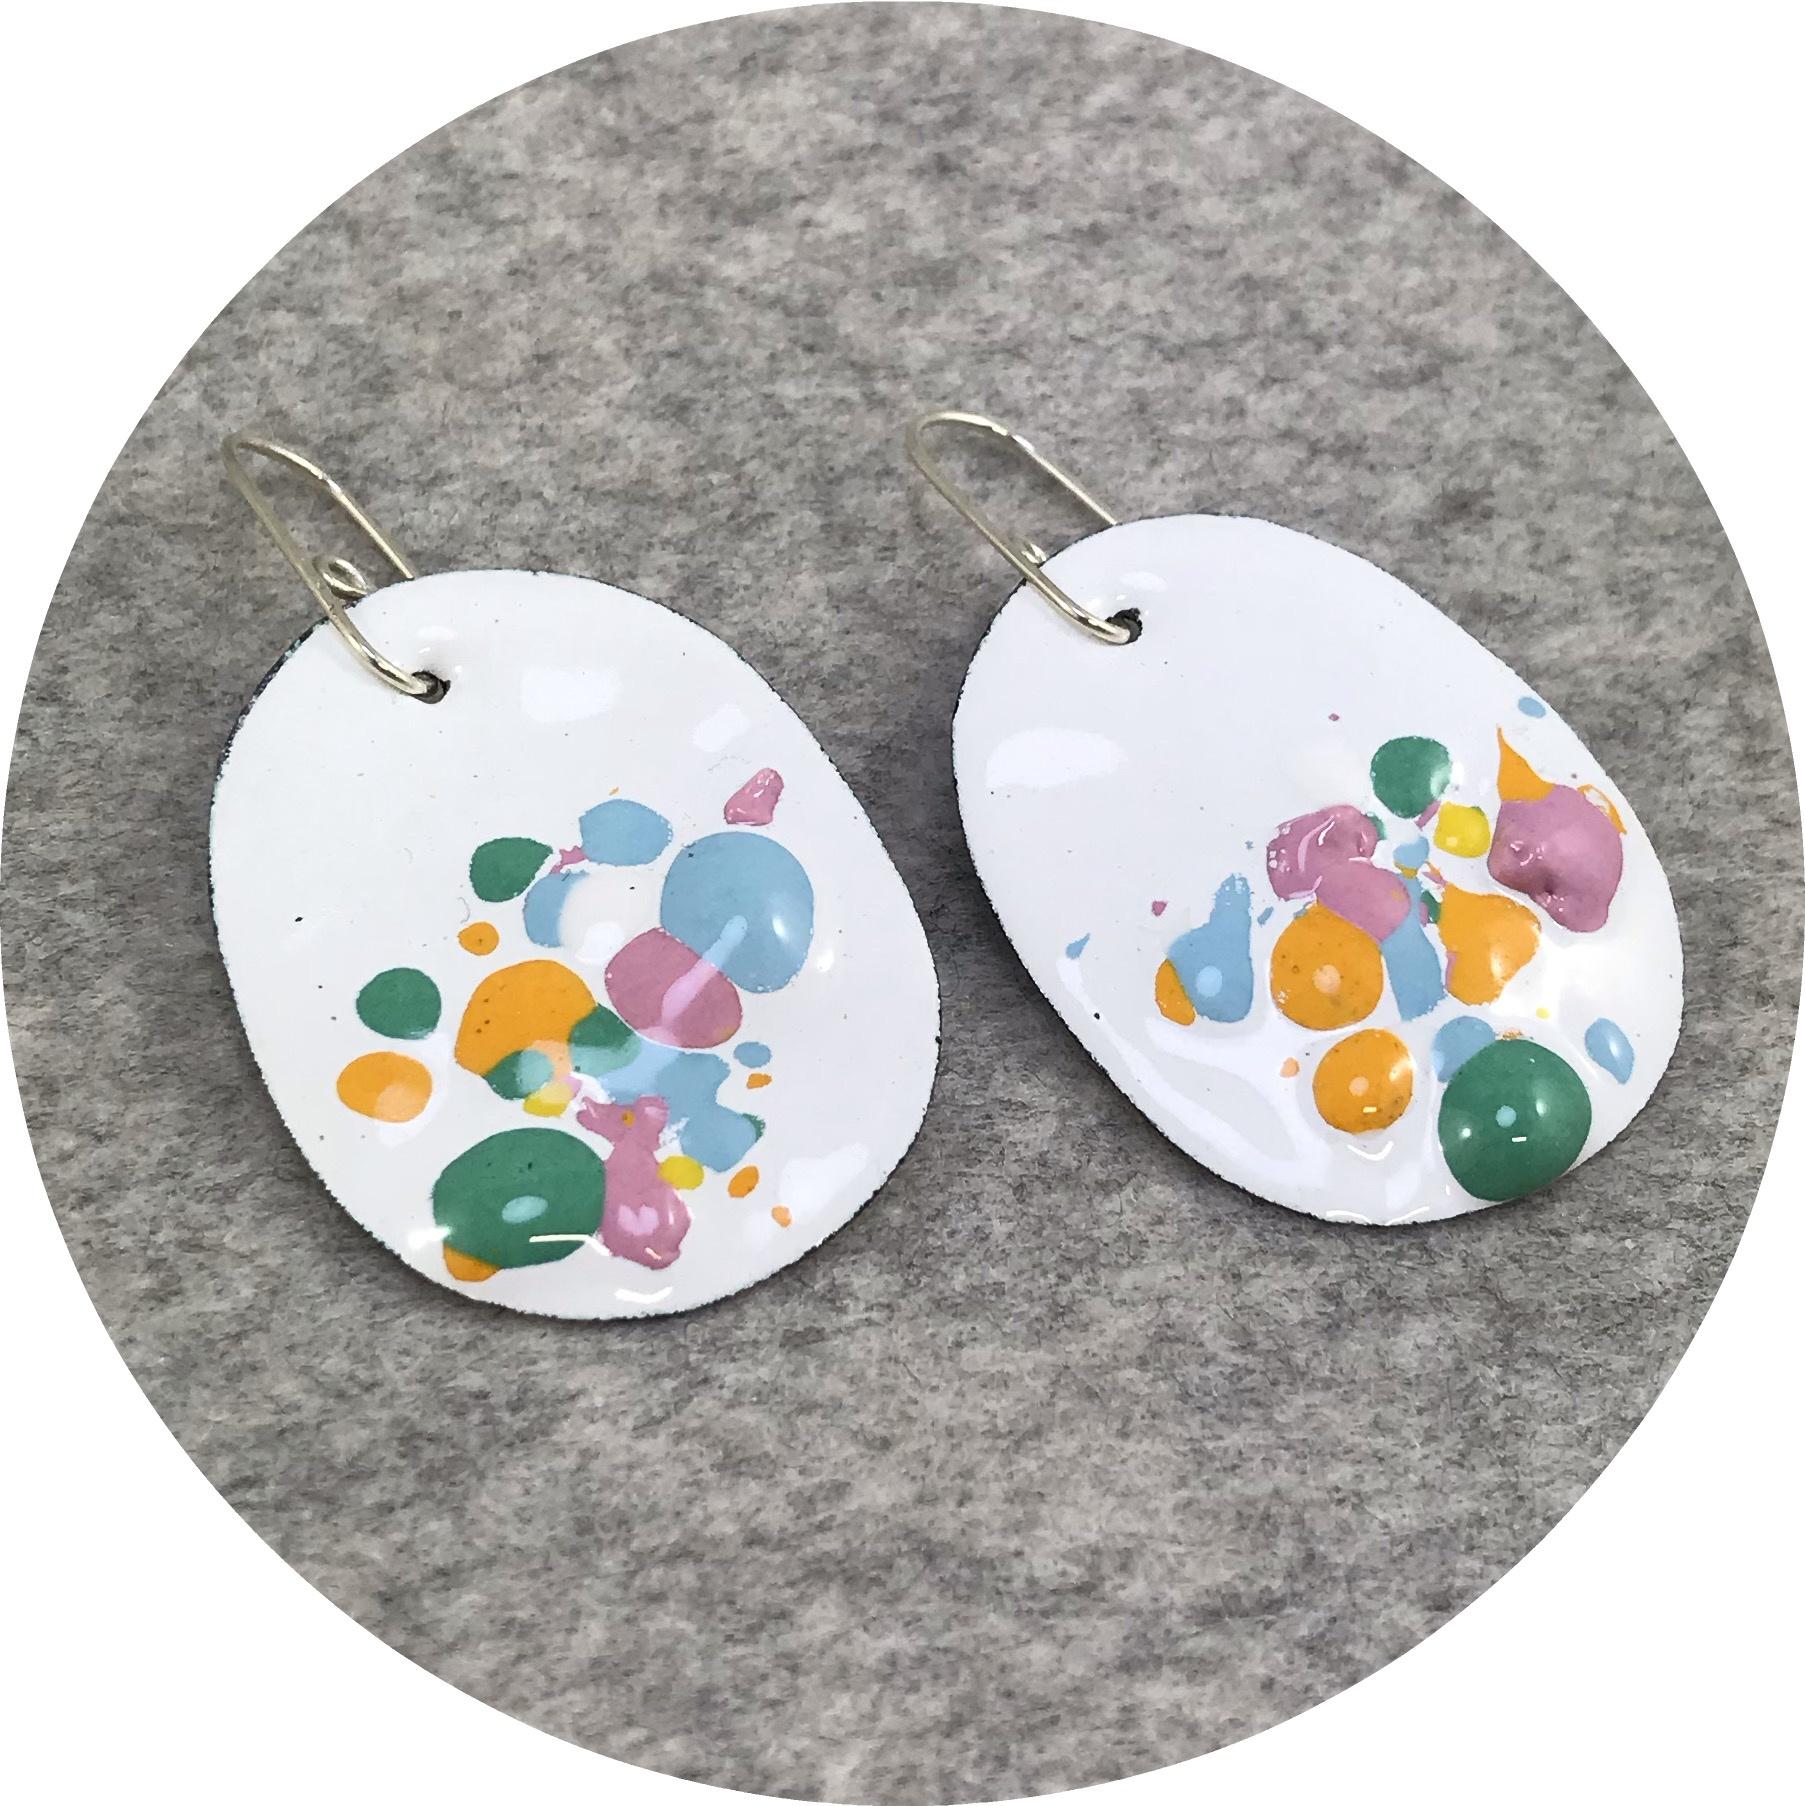 Jenna O'Brien - Medium Queenie Earrings with White Enamel and Candy Coloured Flecks